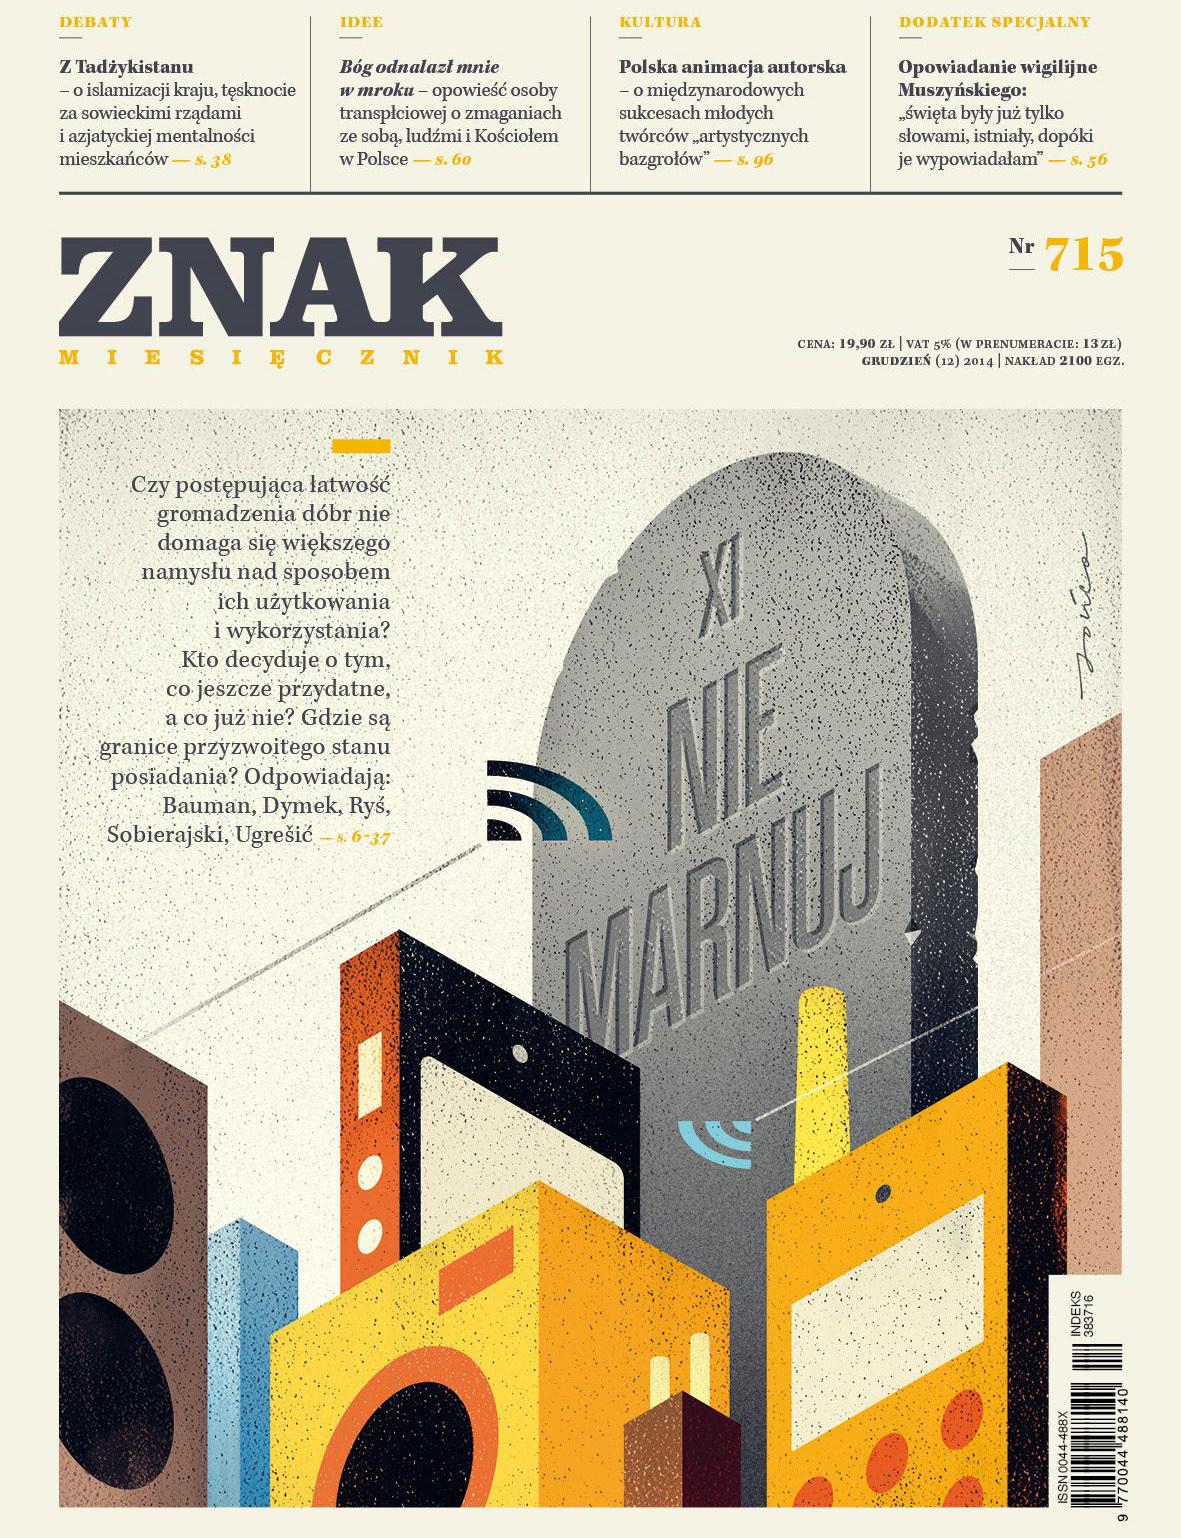 Pawel Jonca  Illustration artist  - Smart home